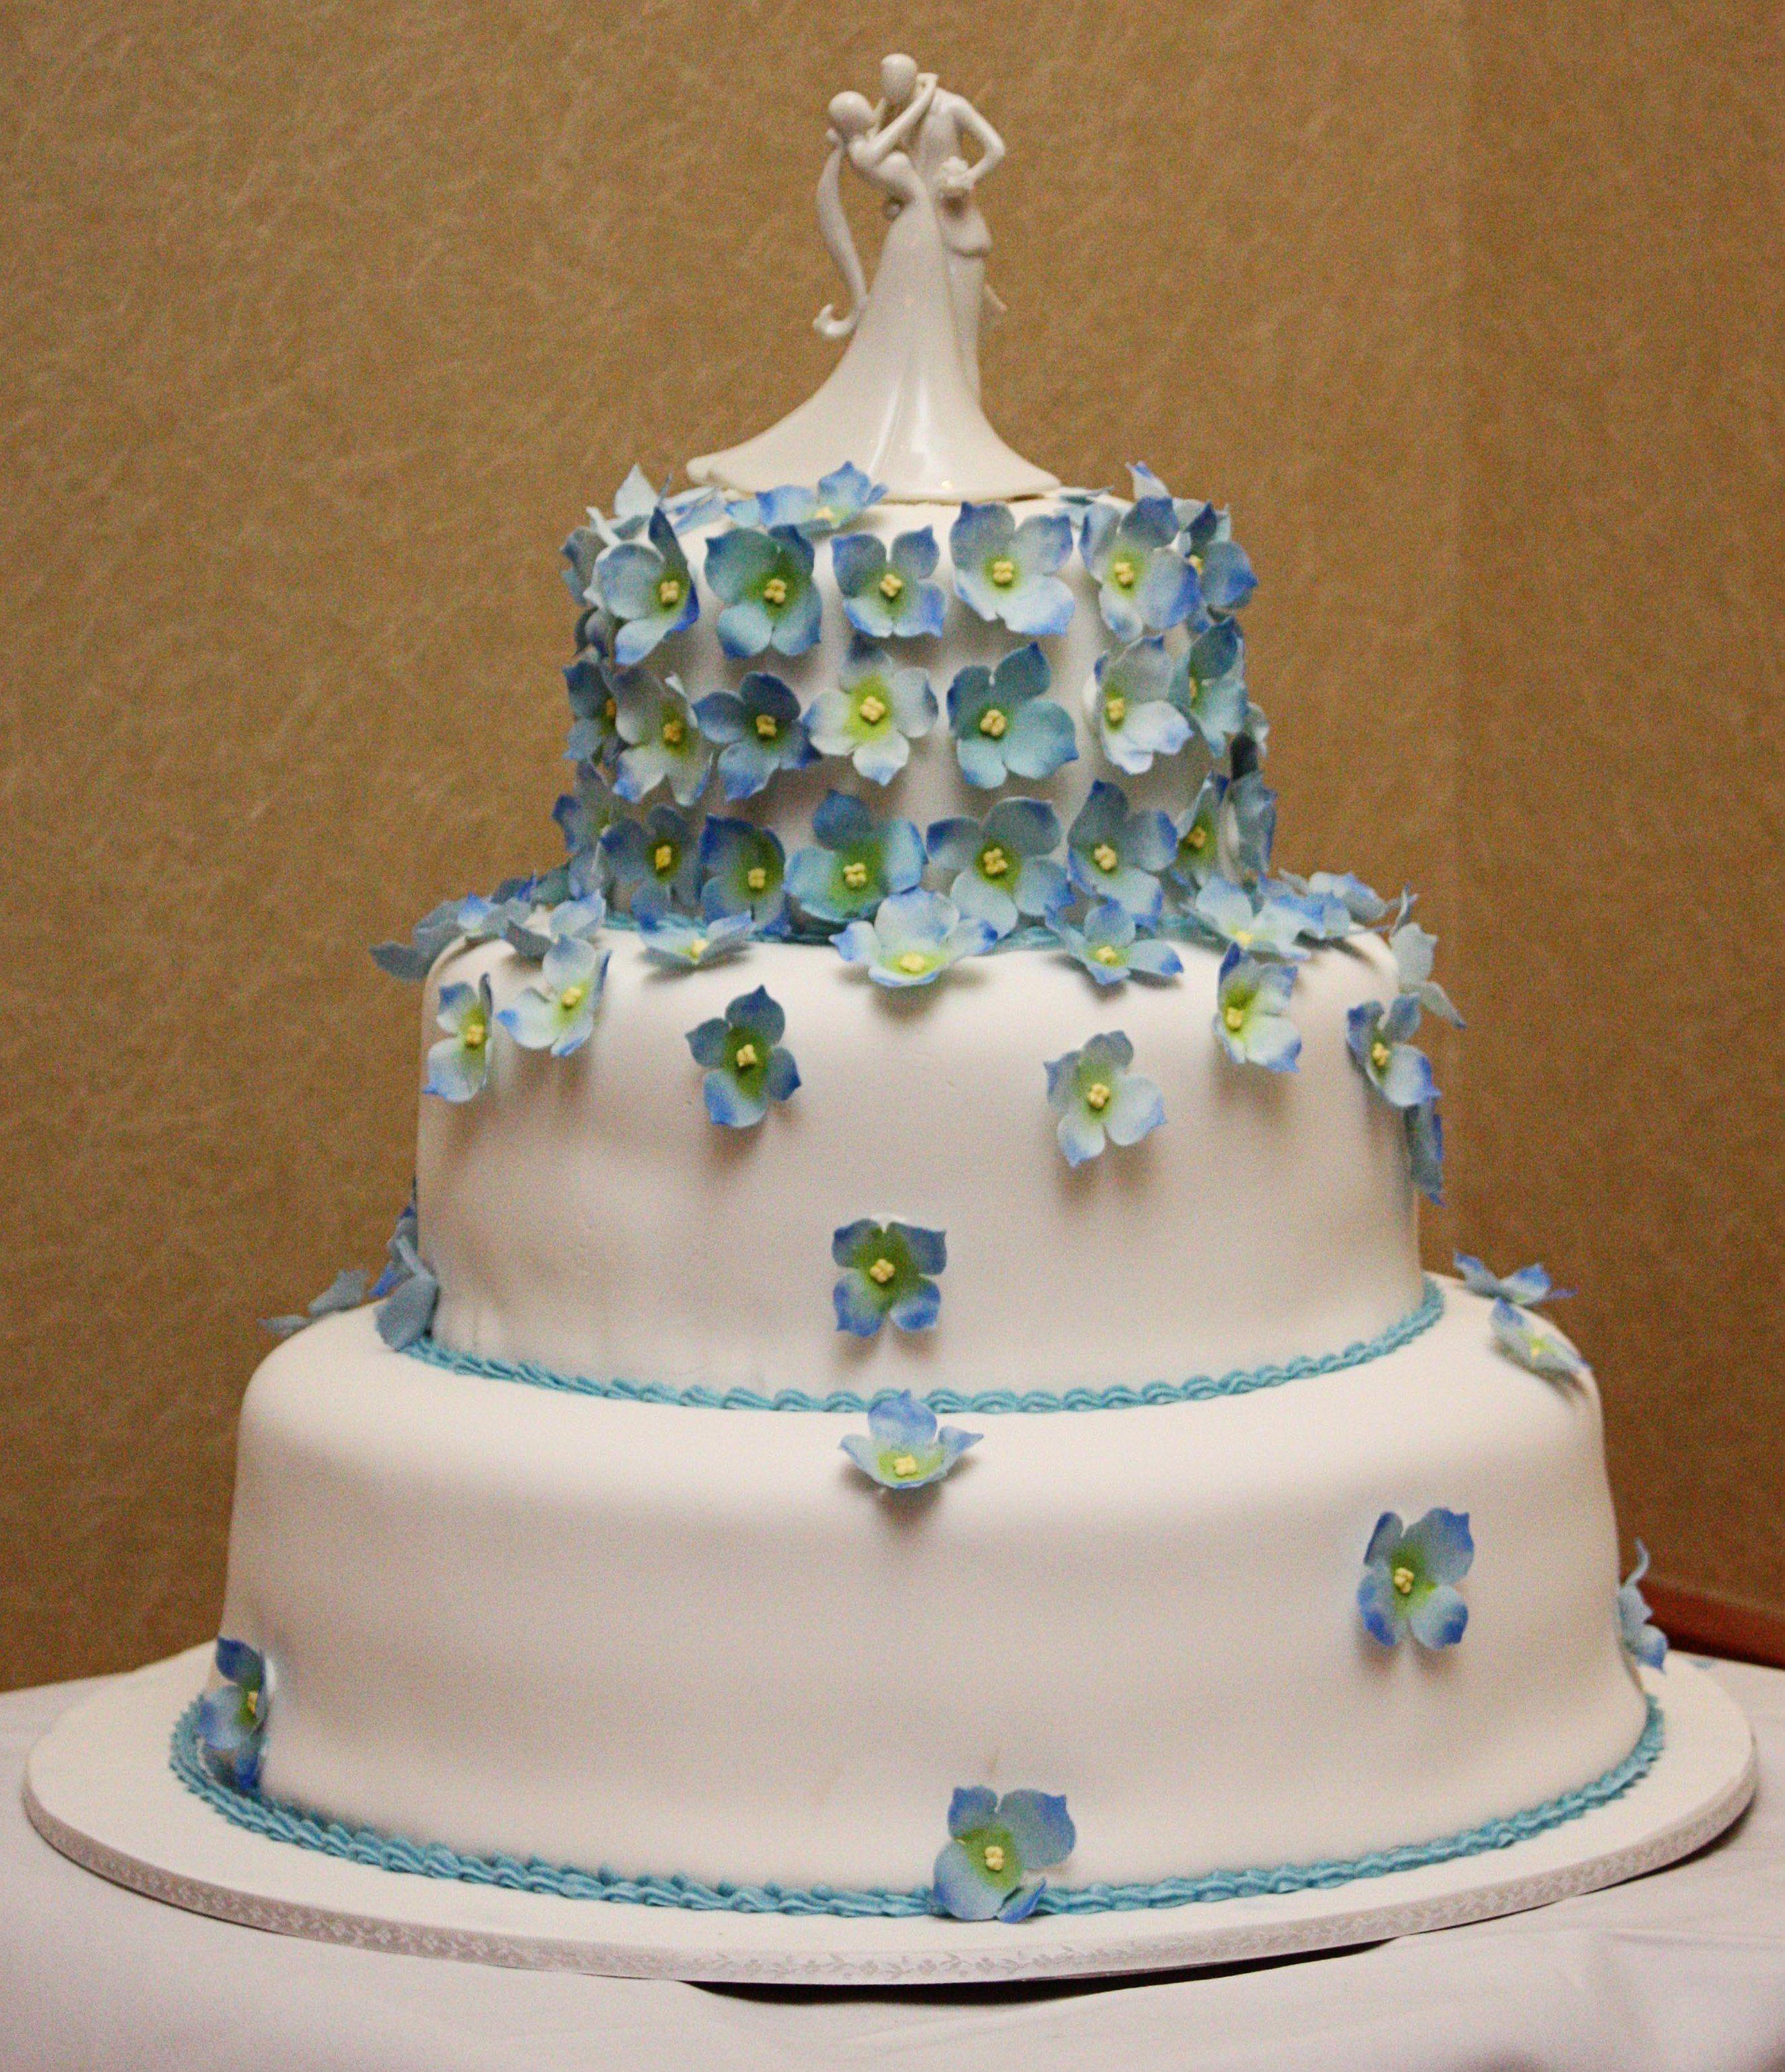 my wedding cake, by kimberly middleton